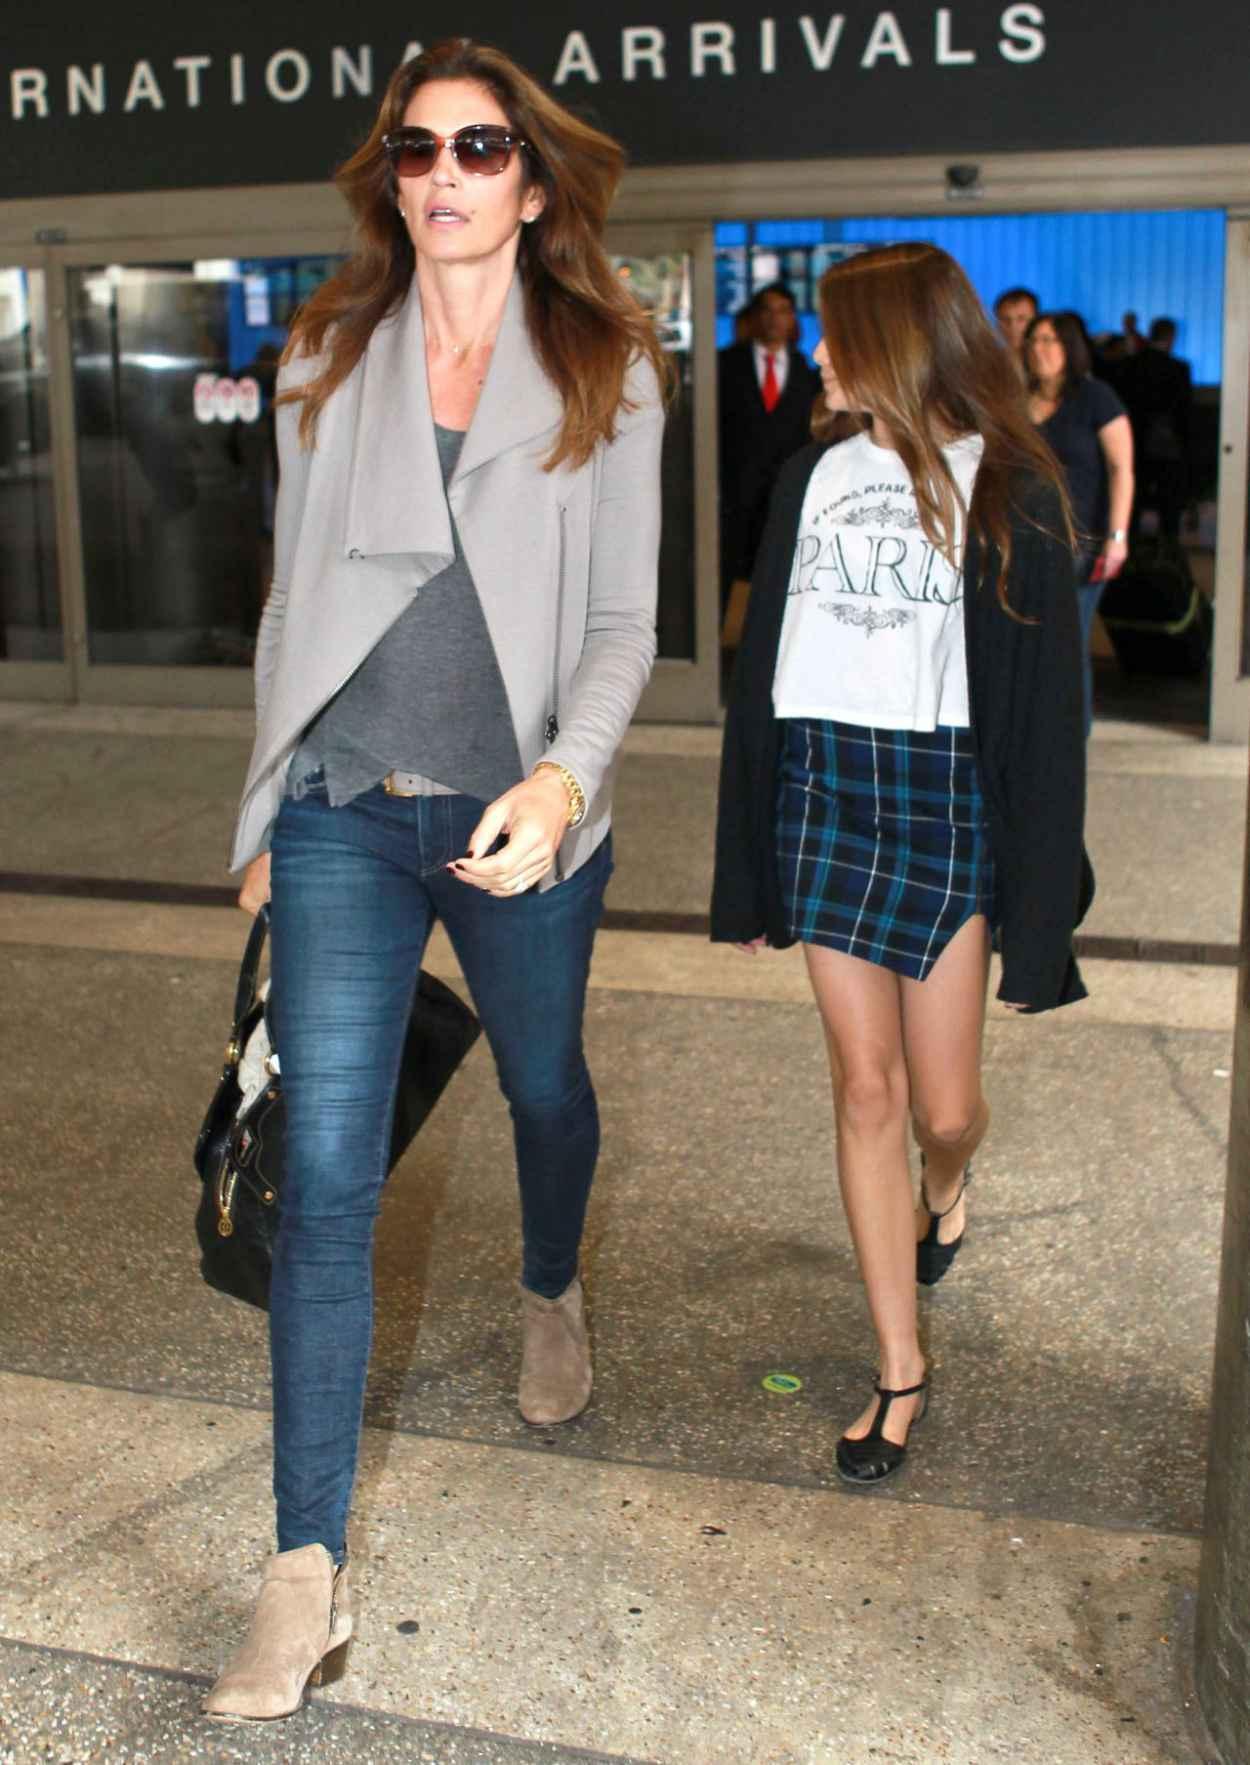 Cindy Crawford and Kaia Jordan Gerber at LAX Airport - May 2015-2